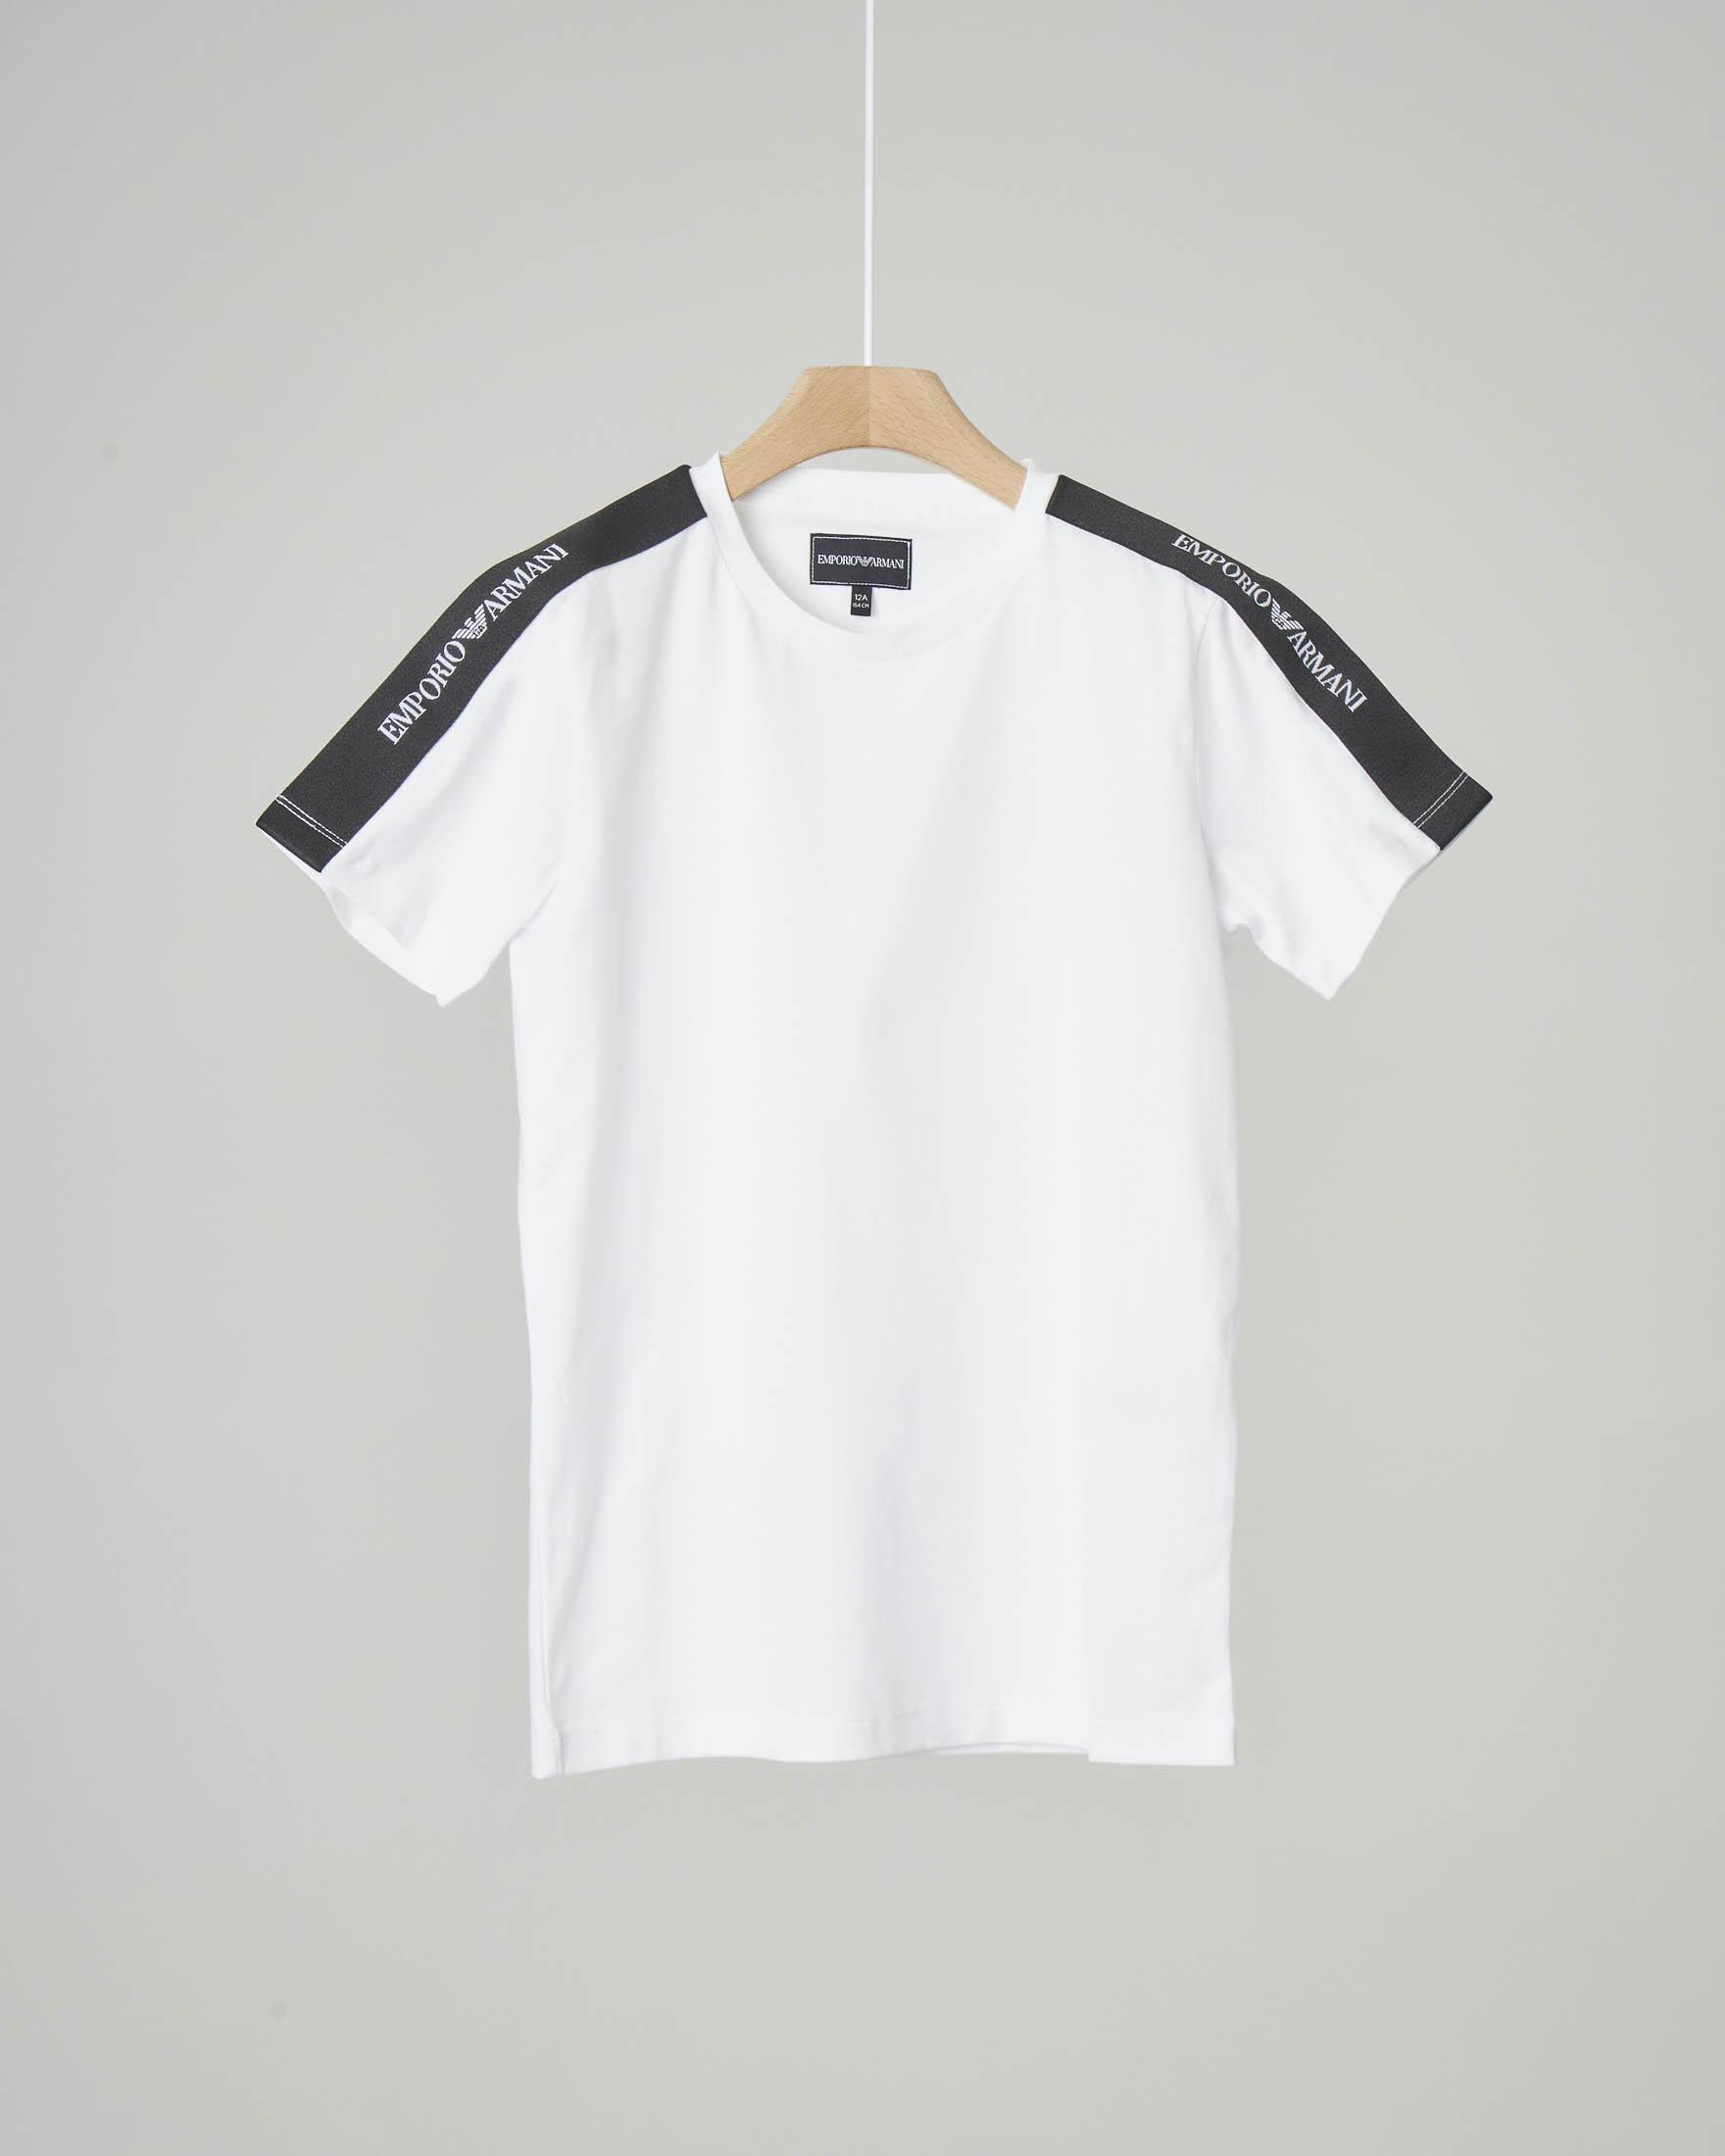 T-shirt bianca con banda logata nera sulle spalle 10-16 anni